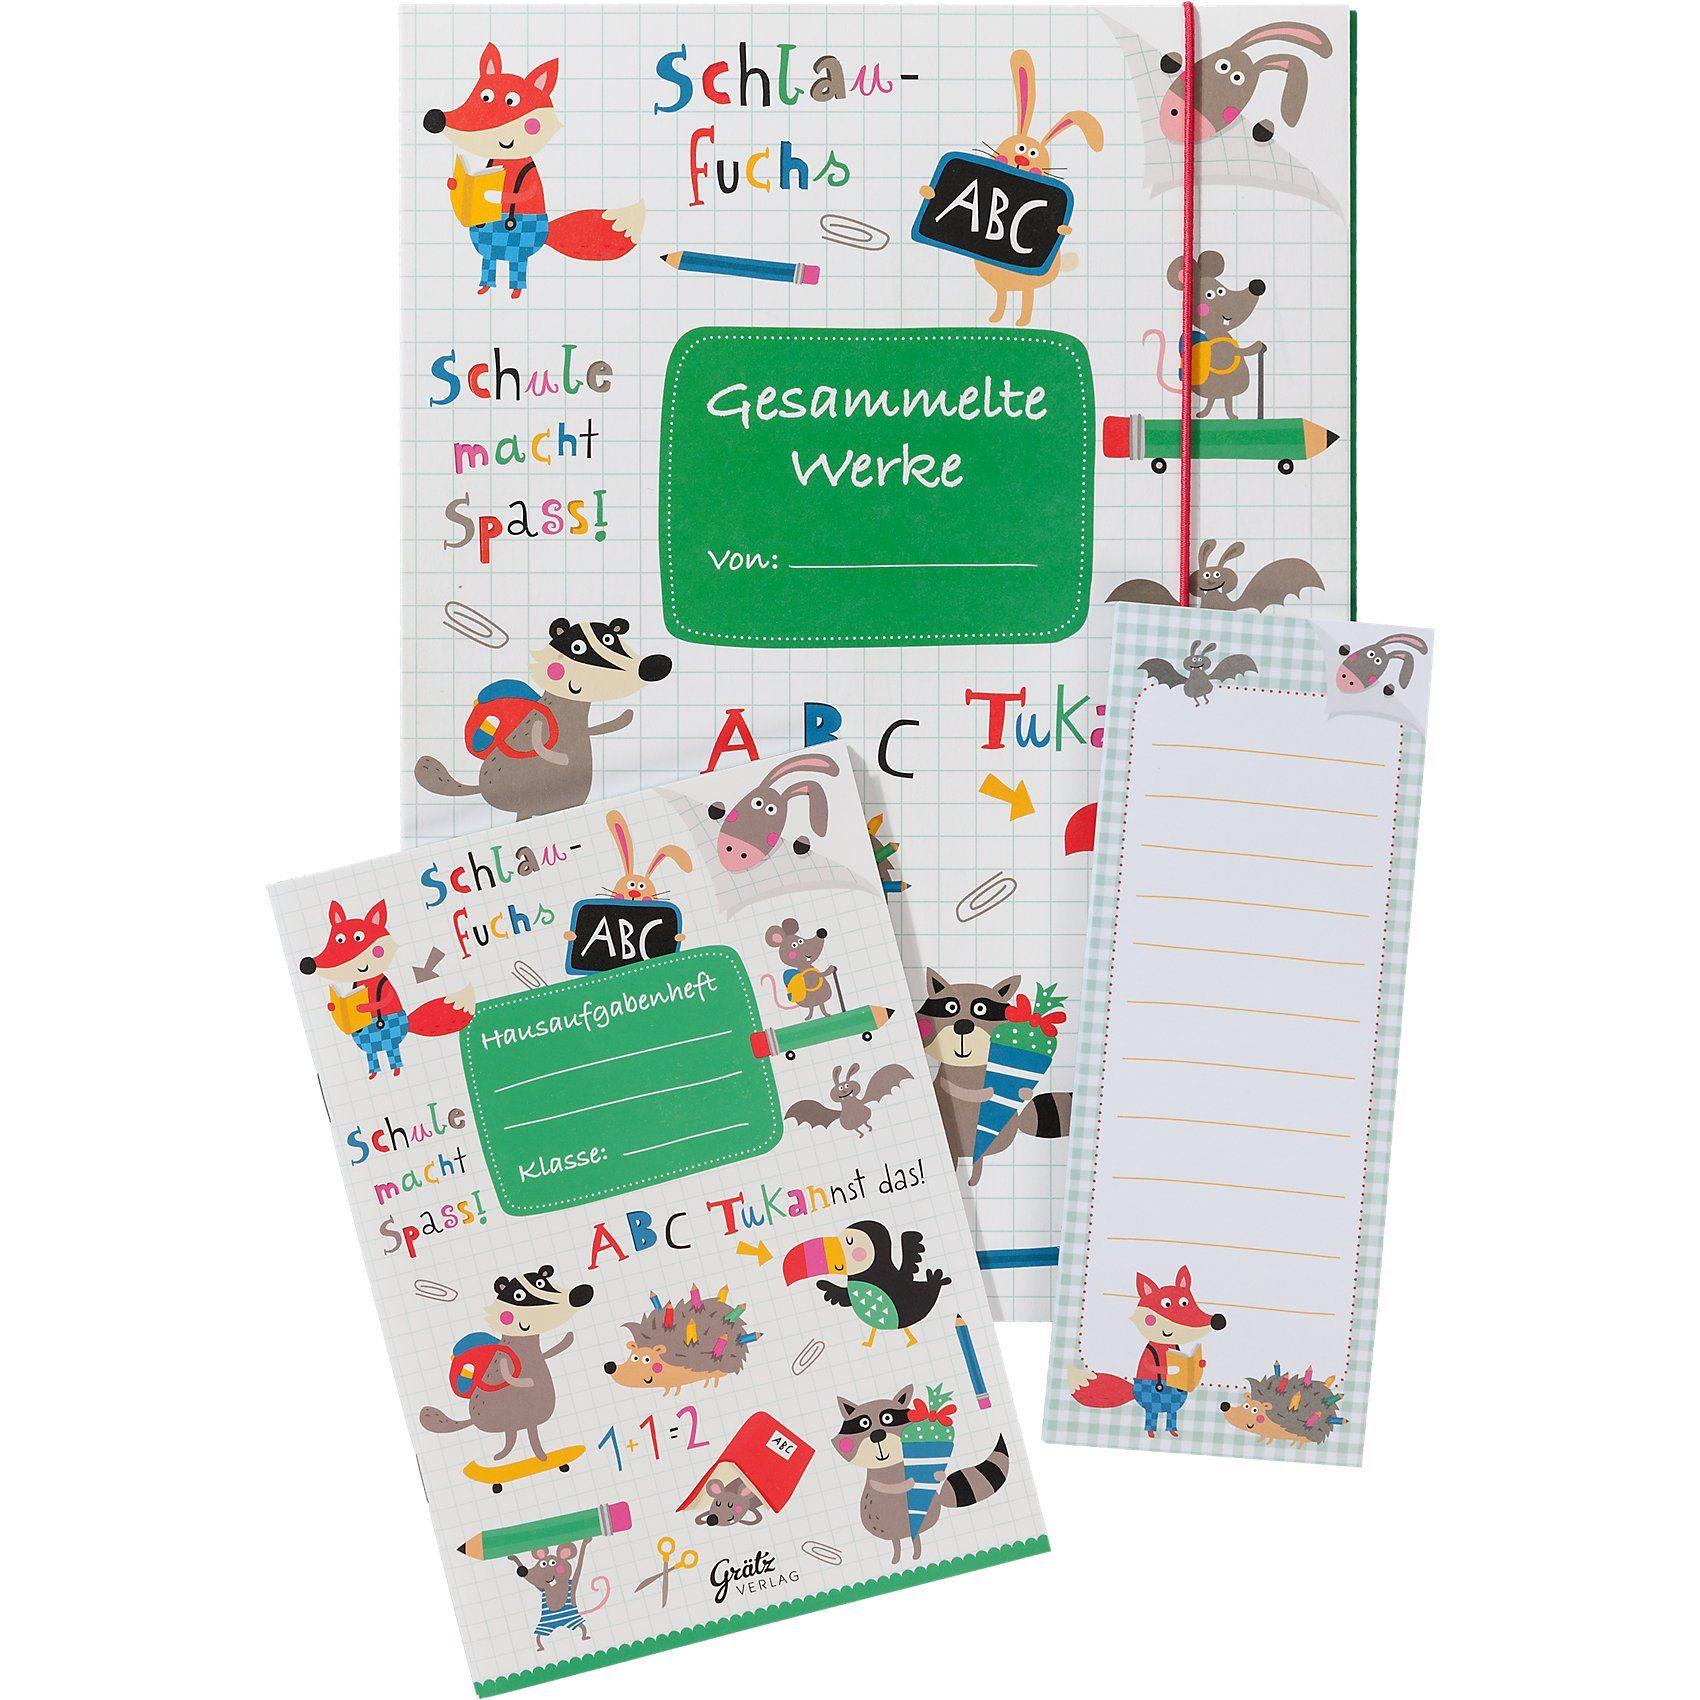 Grätz Verlag Schulset ABC, 3-tlg.